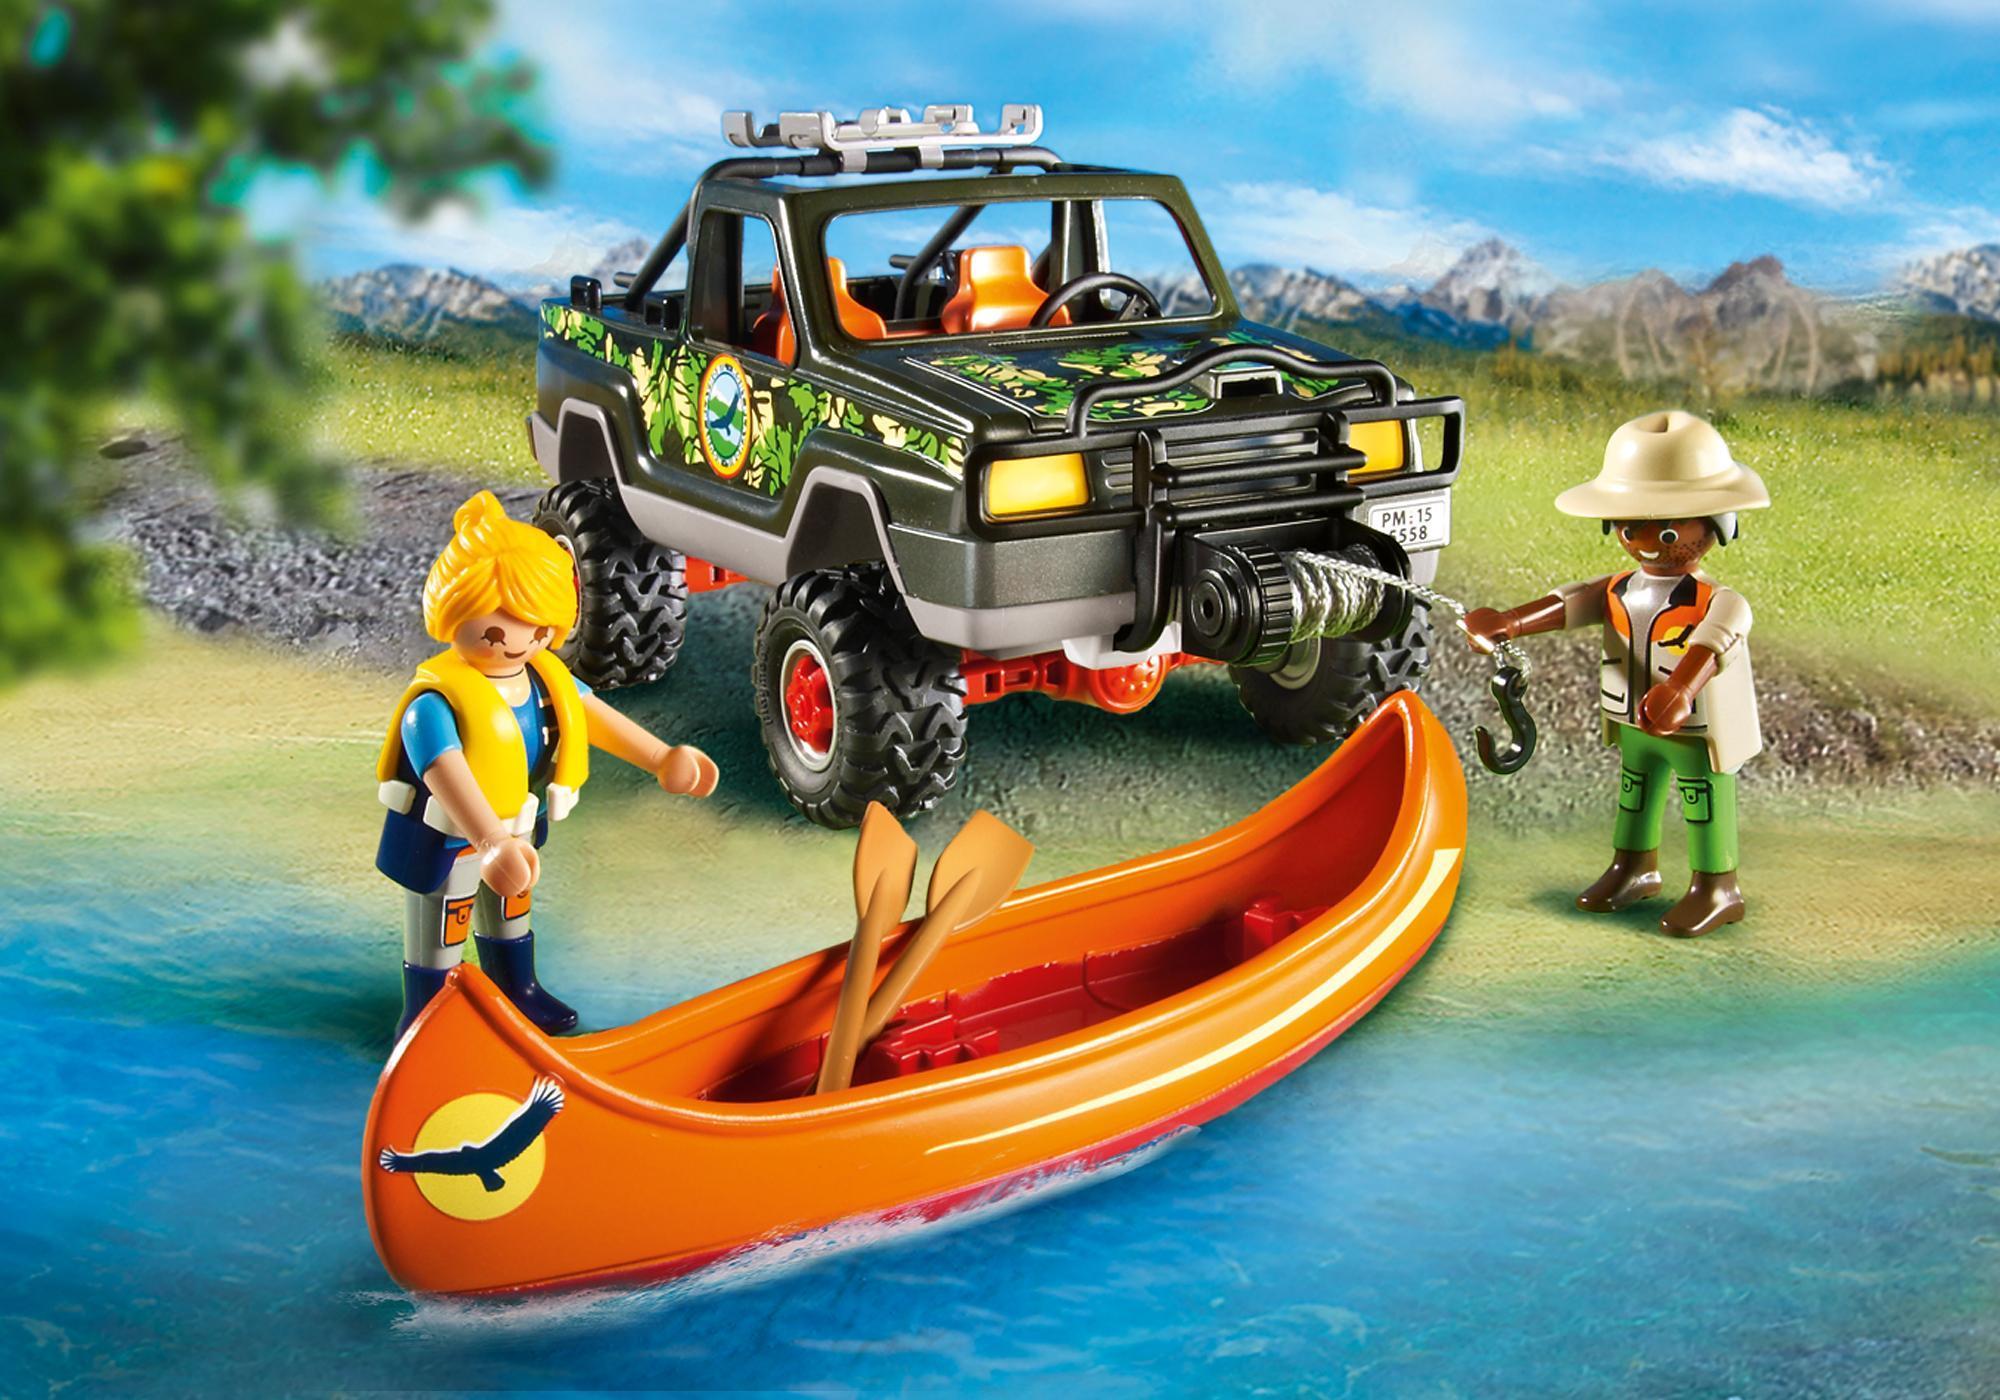 http://media.playmobil.com/i/playmobil/5558_product_extra2